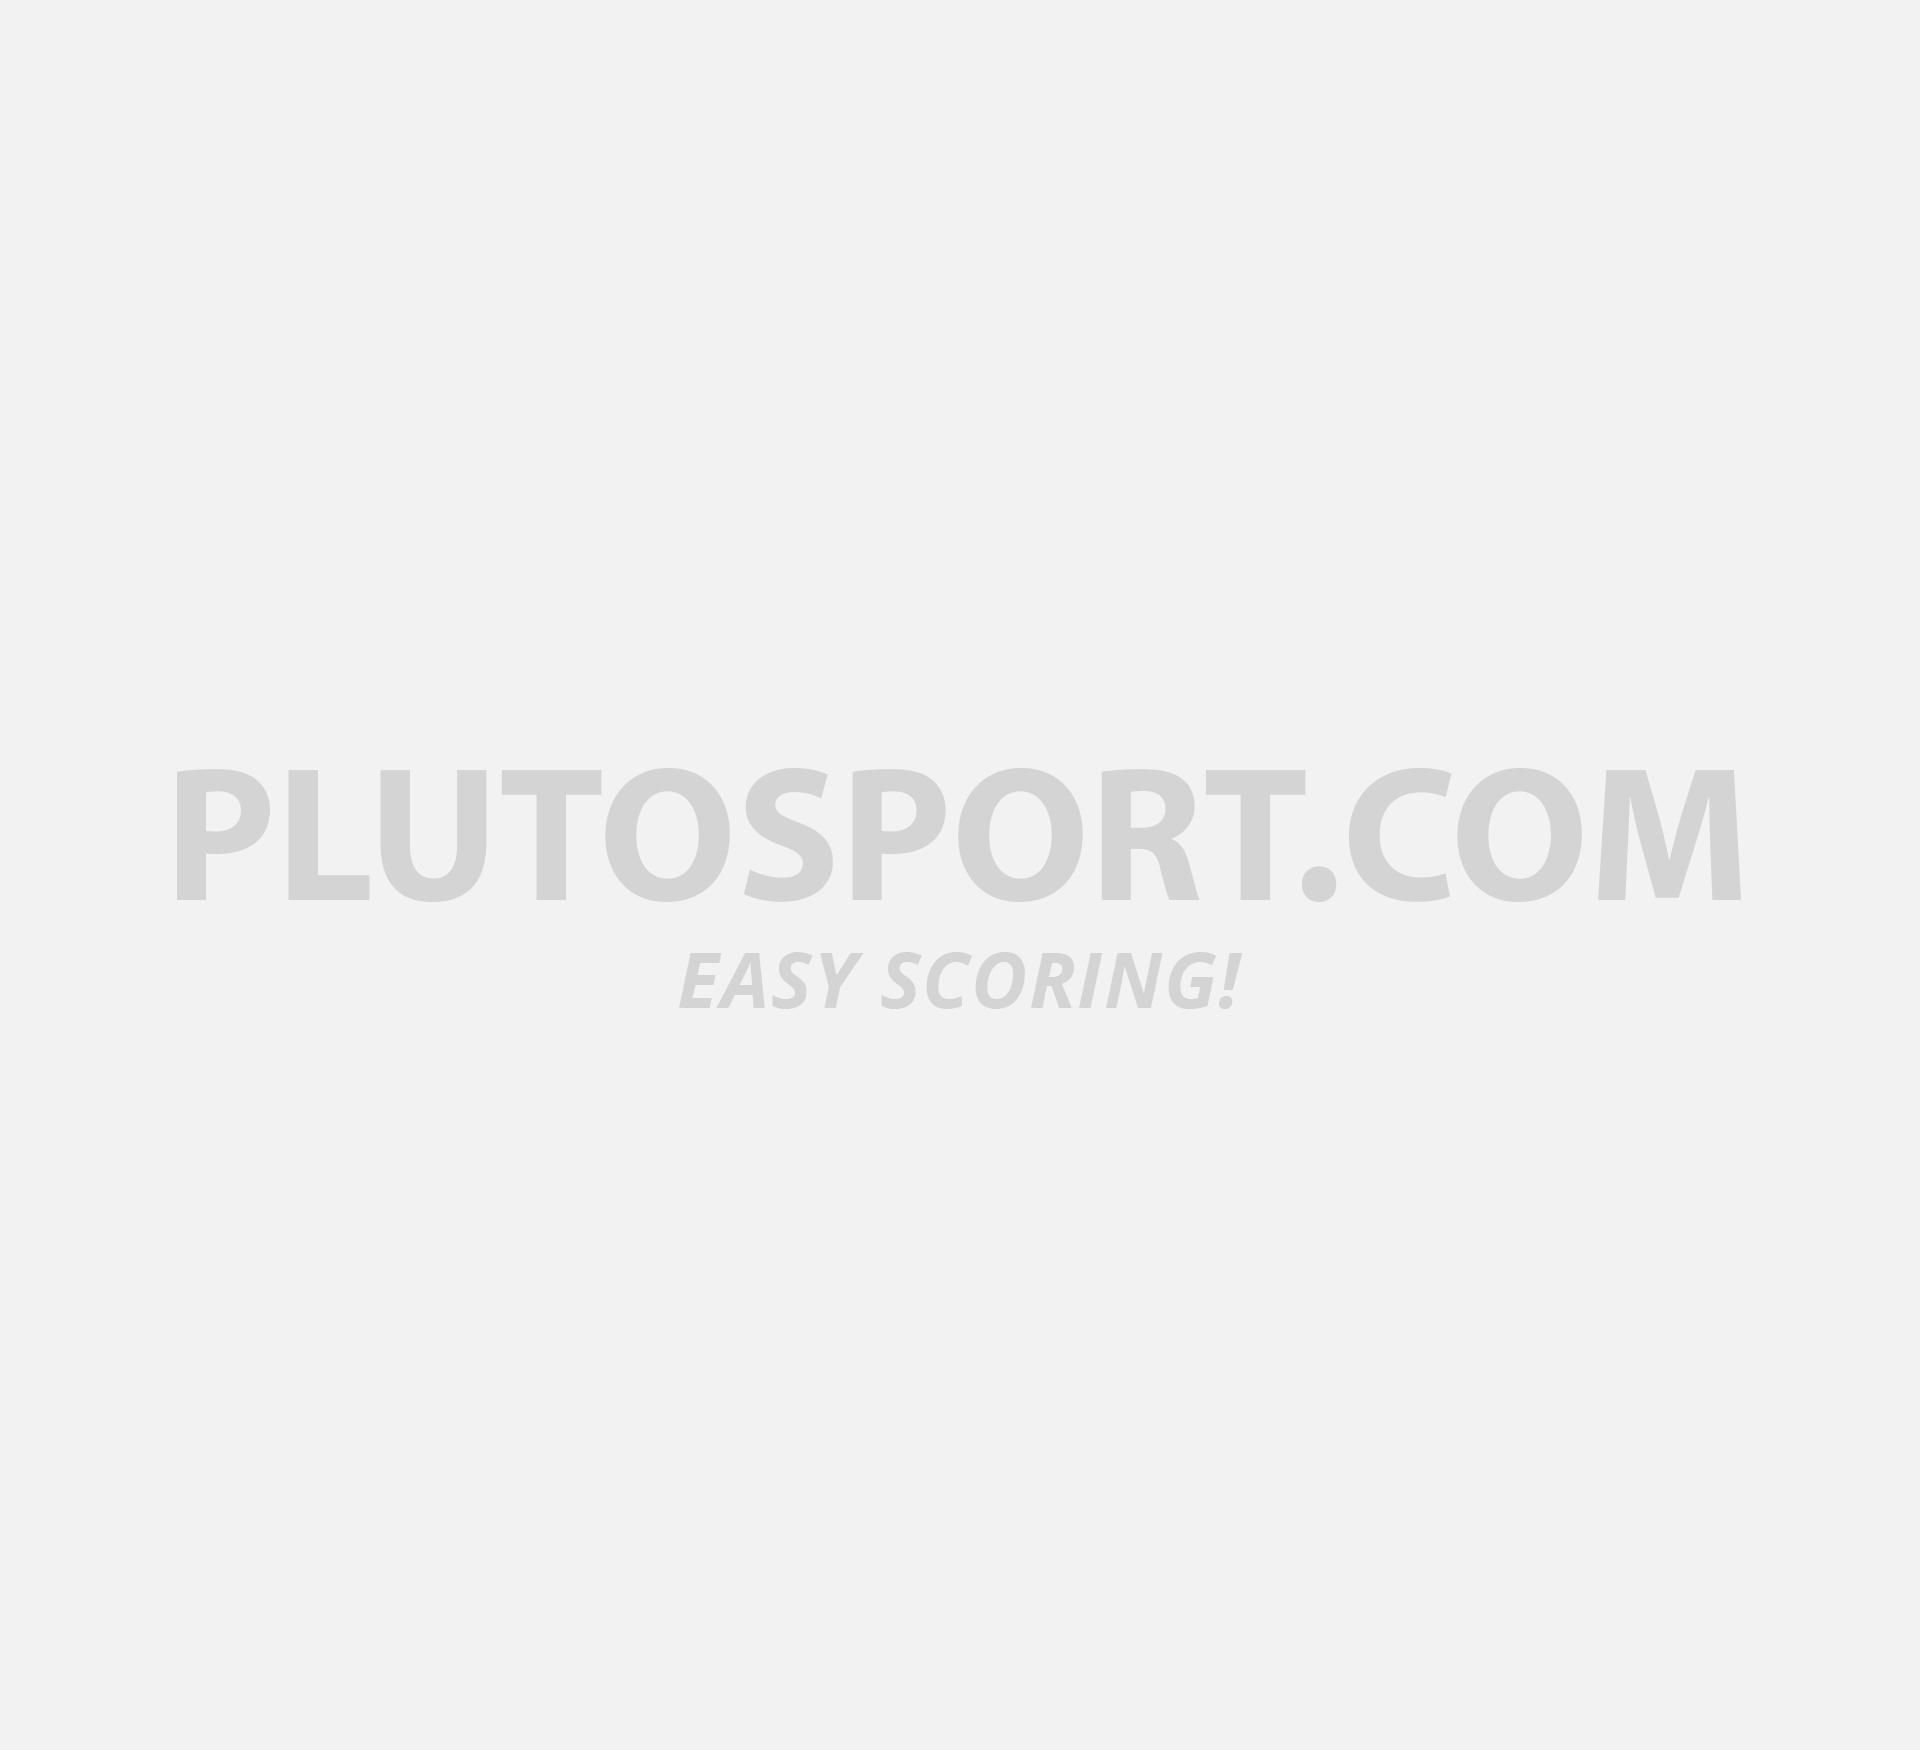 Nike Brief Boxershorts Men (3-Pack)